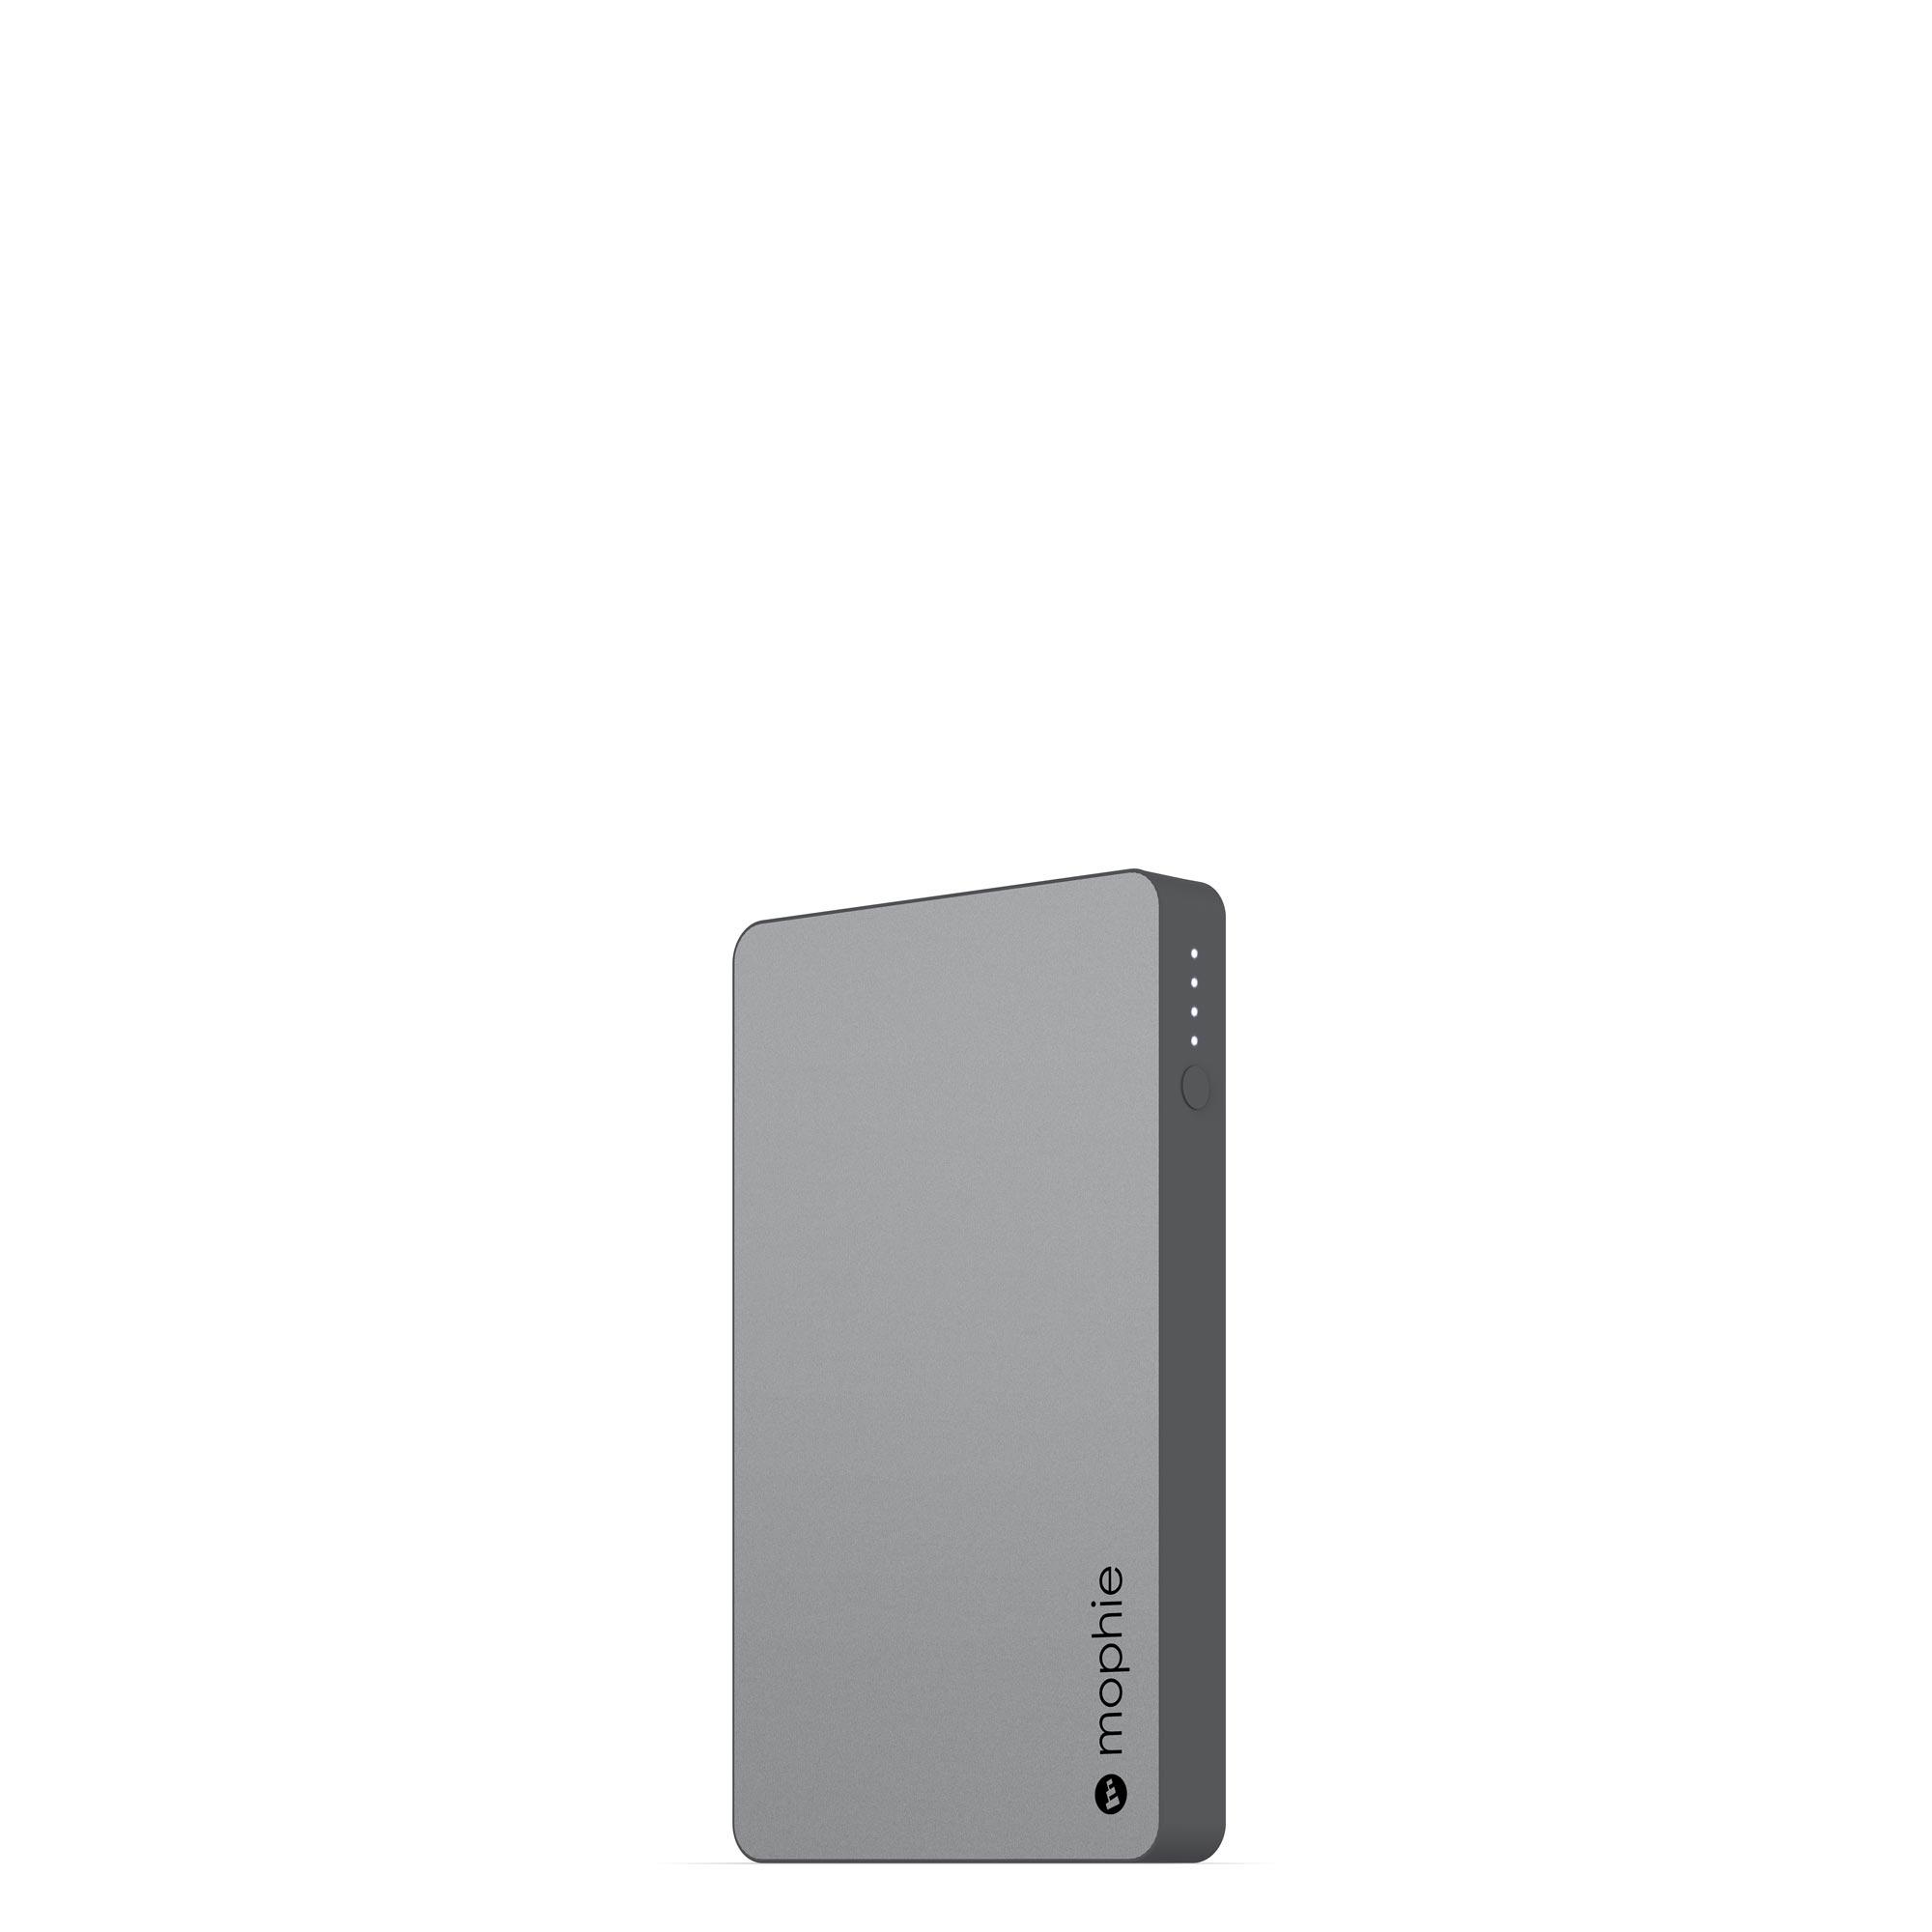 mophie Powerstation batería externa Gris 5050 mAh